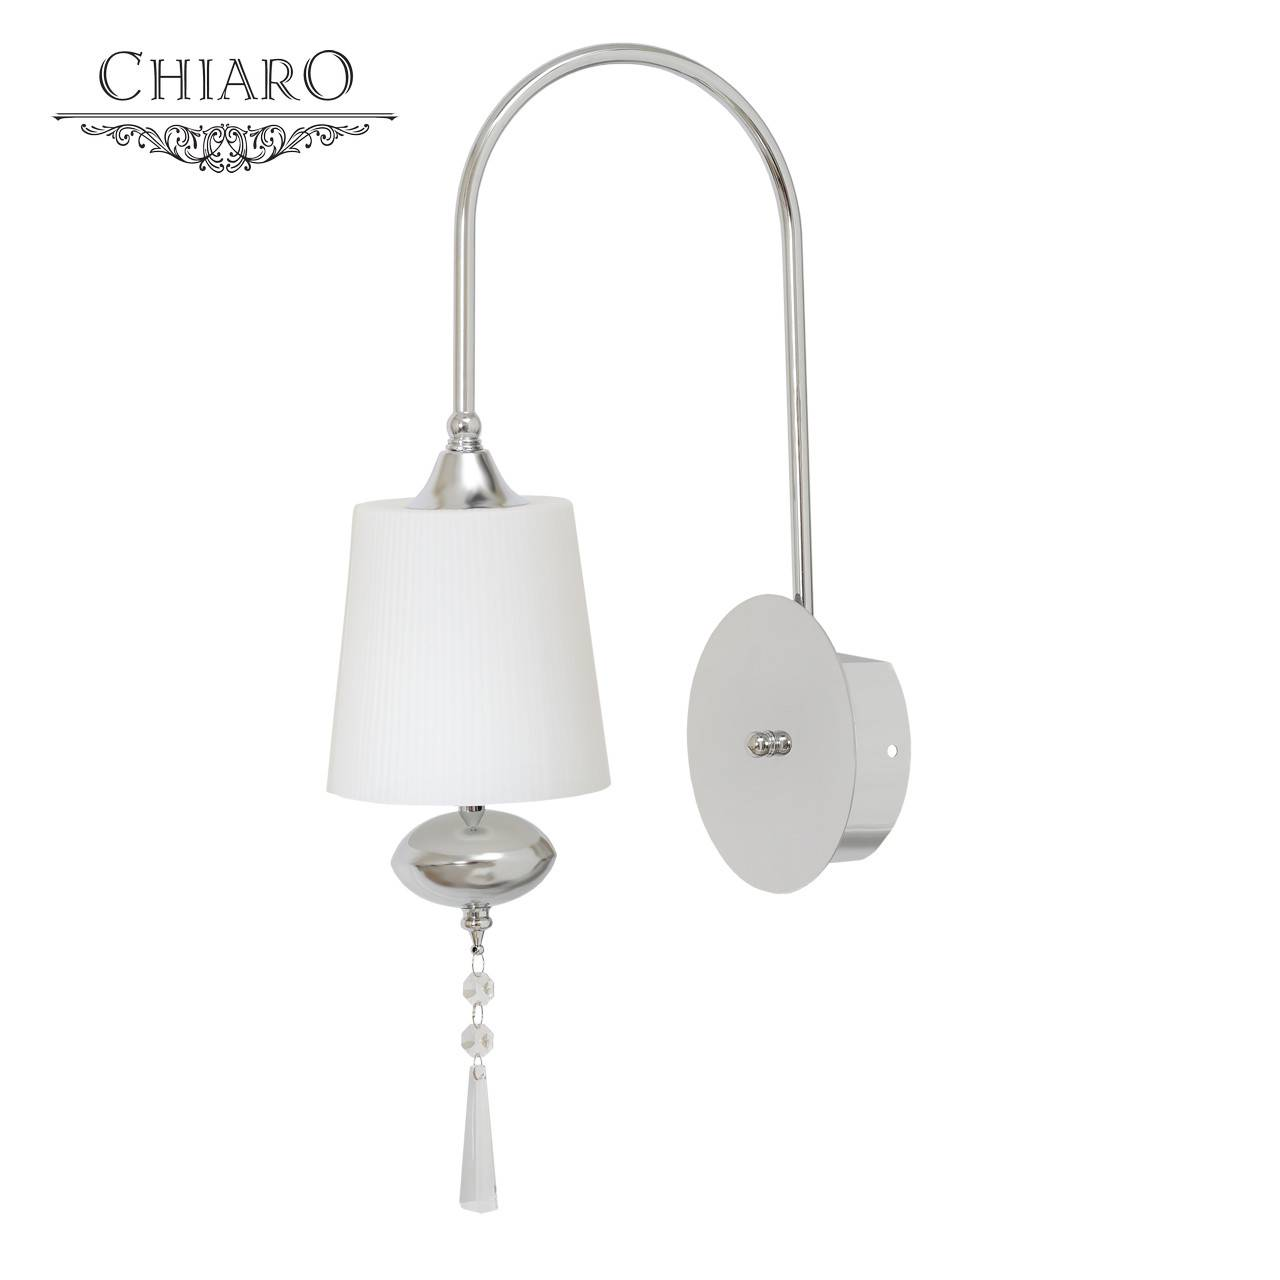 Бра Chiaro, G4, 20 Вт